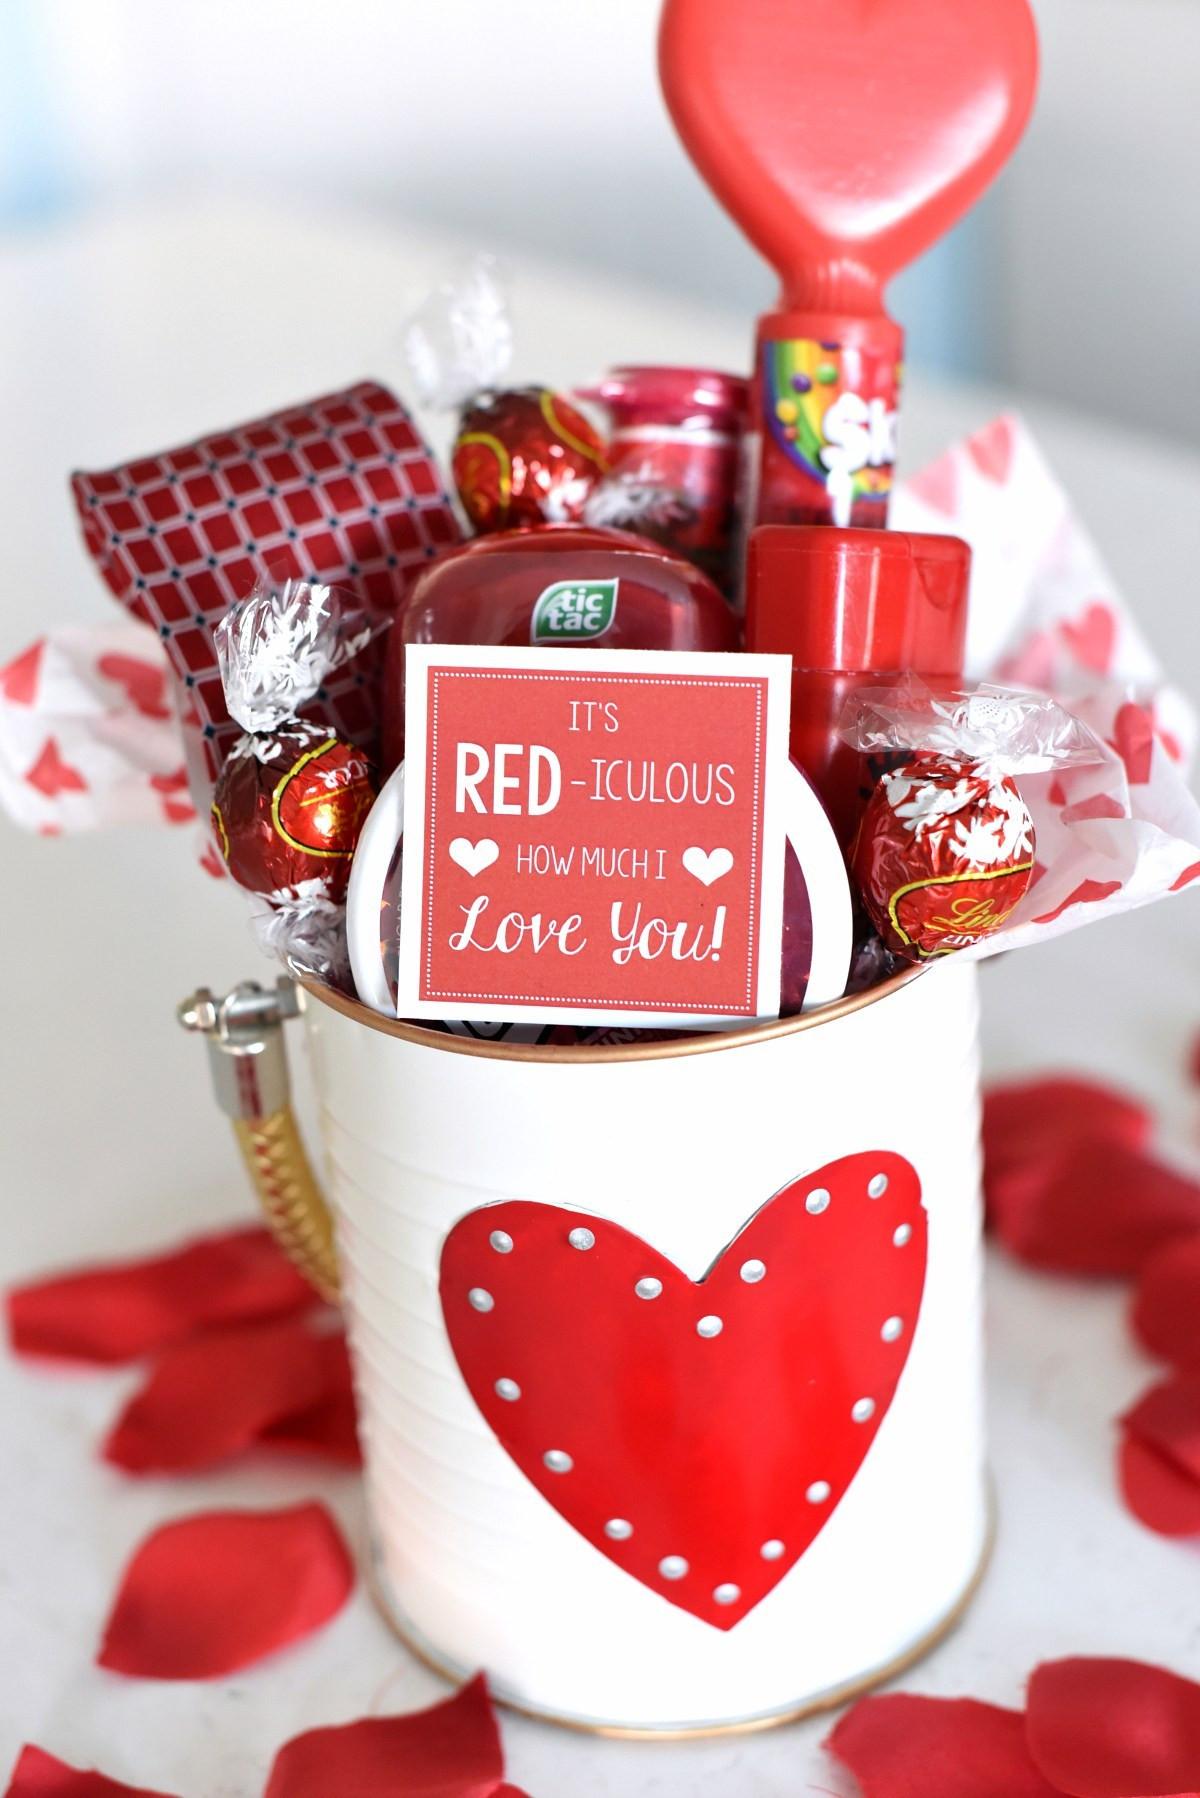 Valentine Day Homemade Gift Ideas  25 DIY Valentine s Day Gift Ideas Teens Will Love